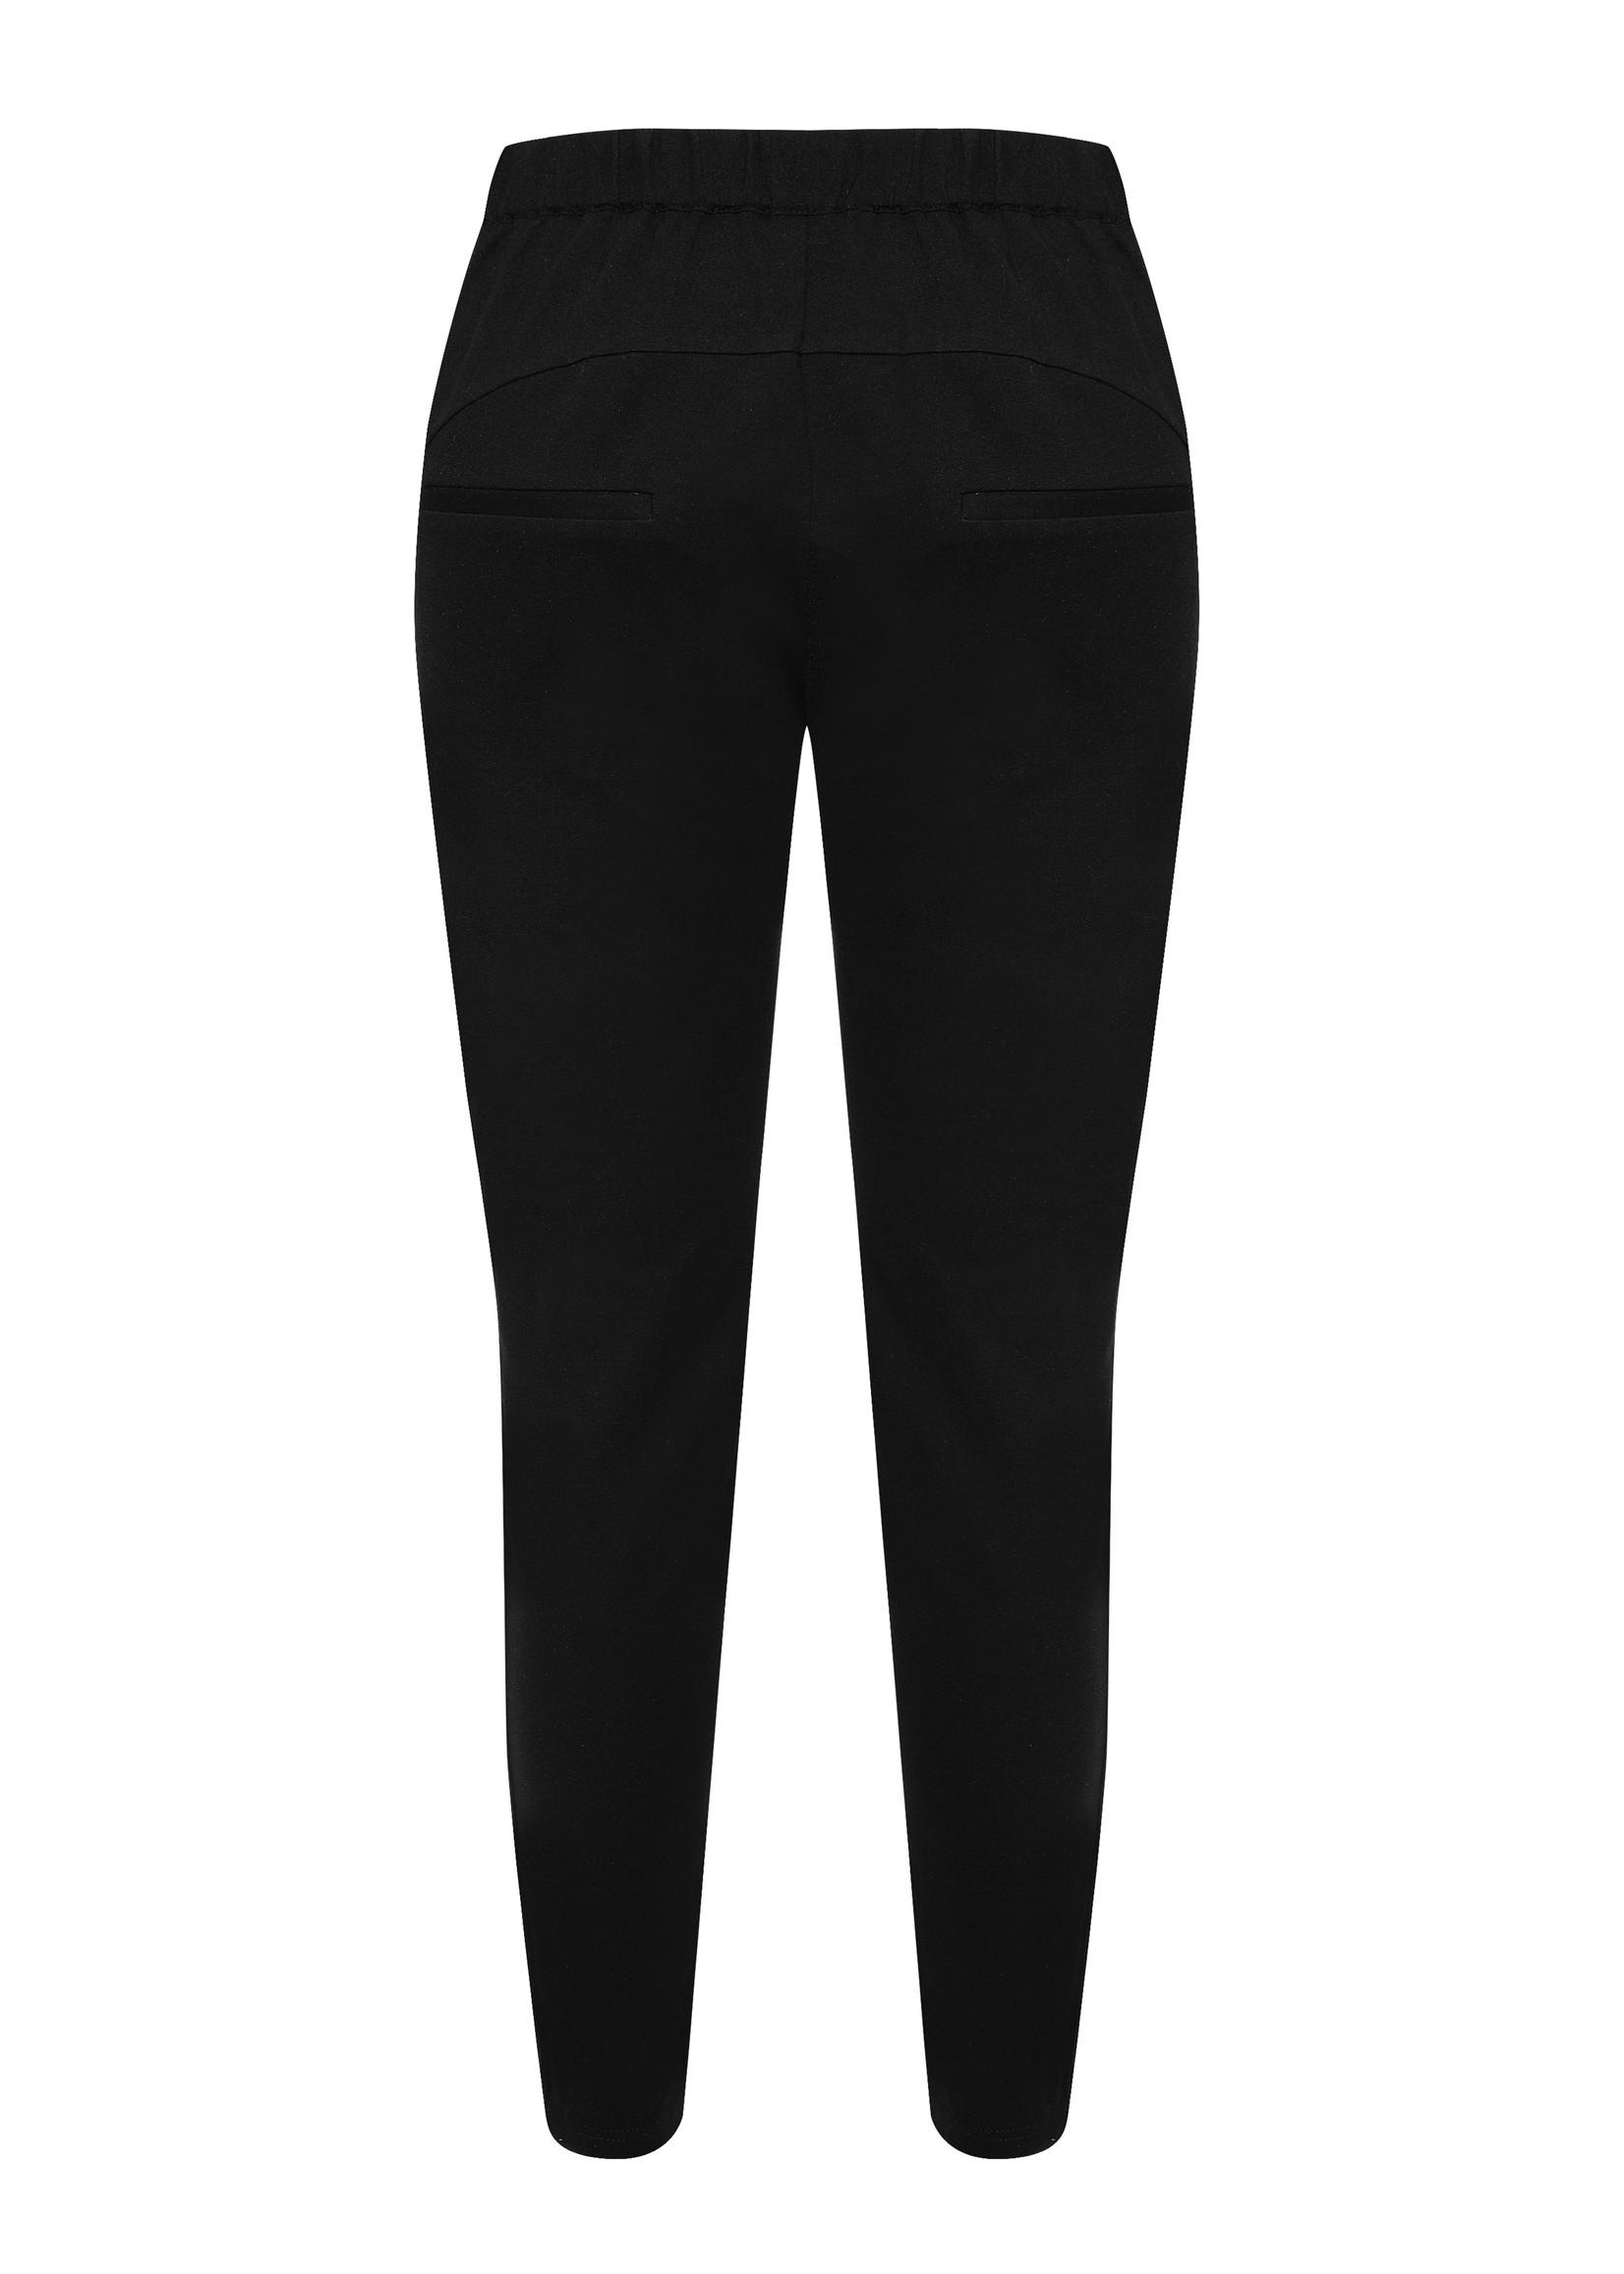 NÜ Bahar Ibi Trousers